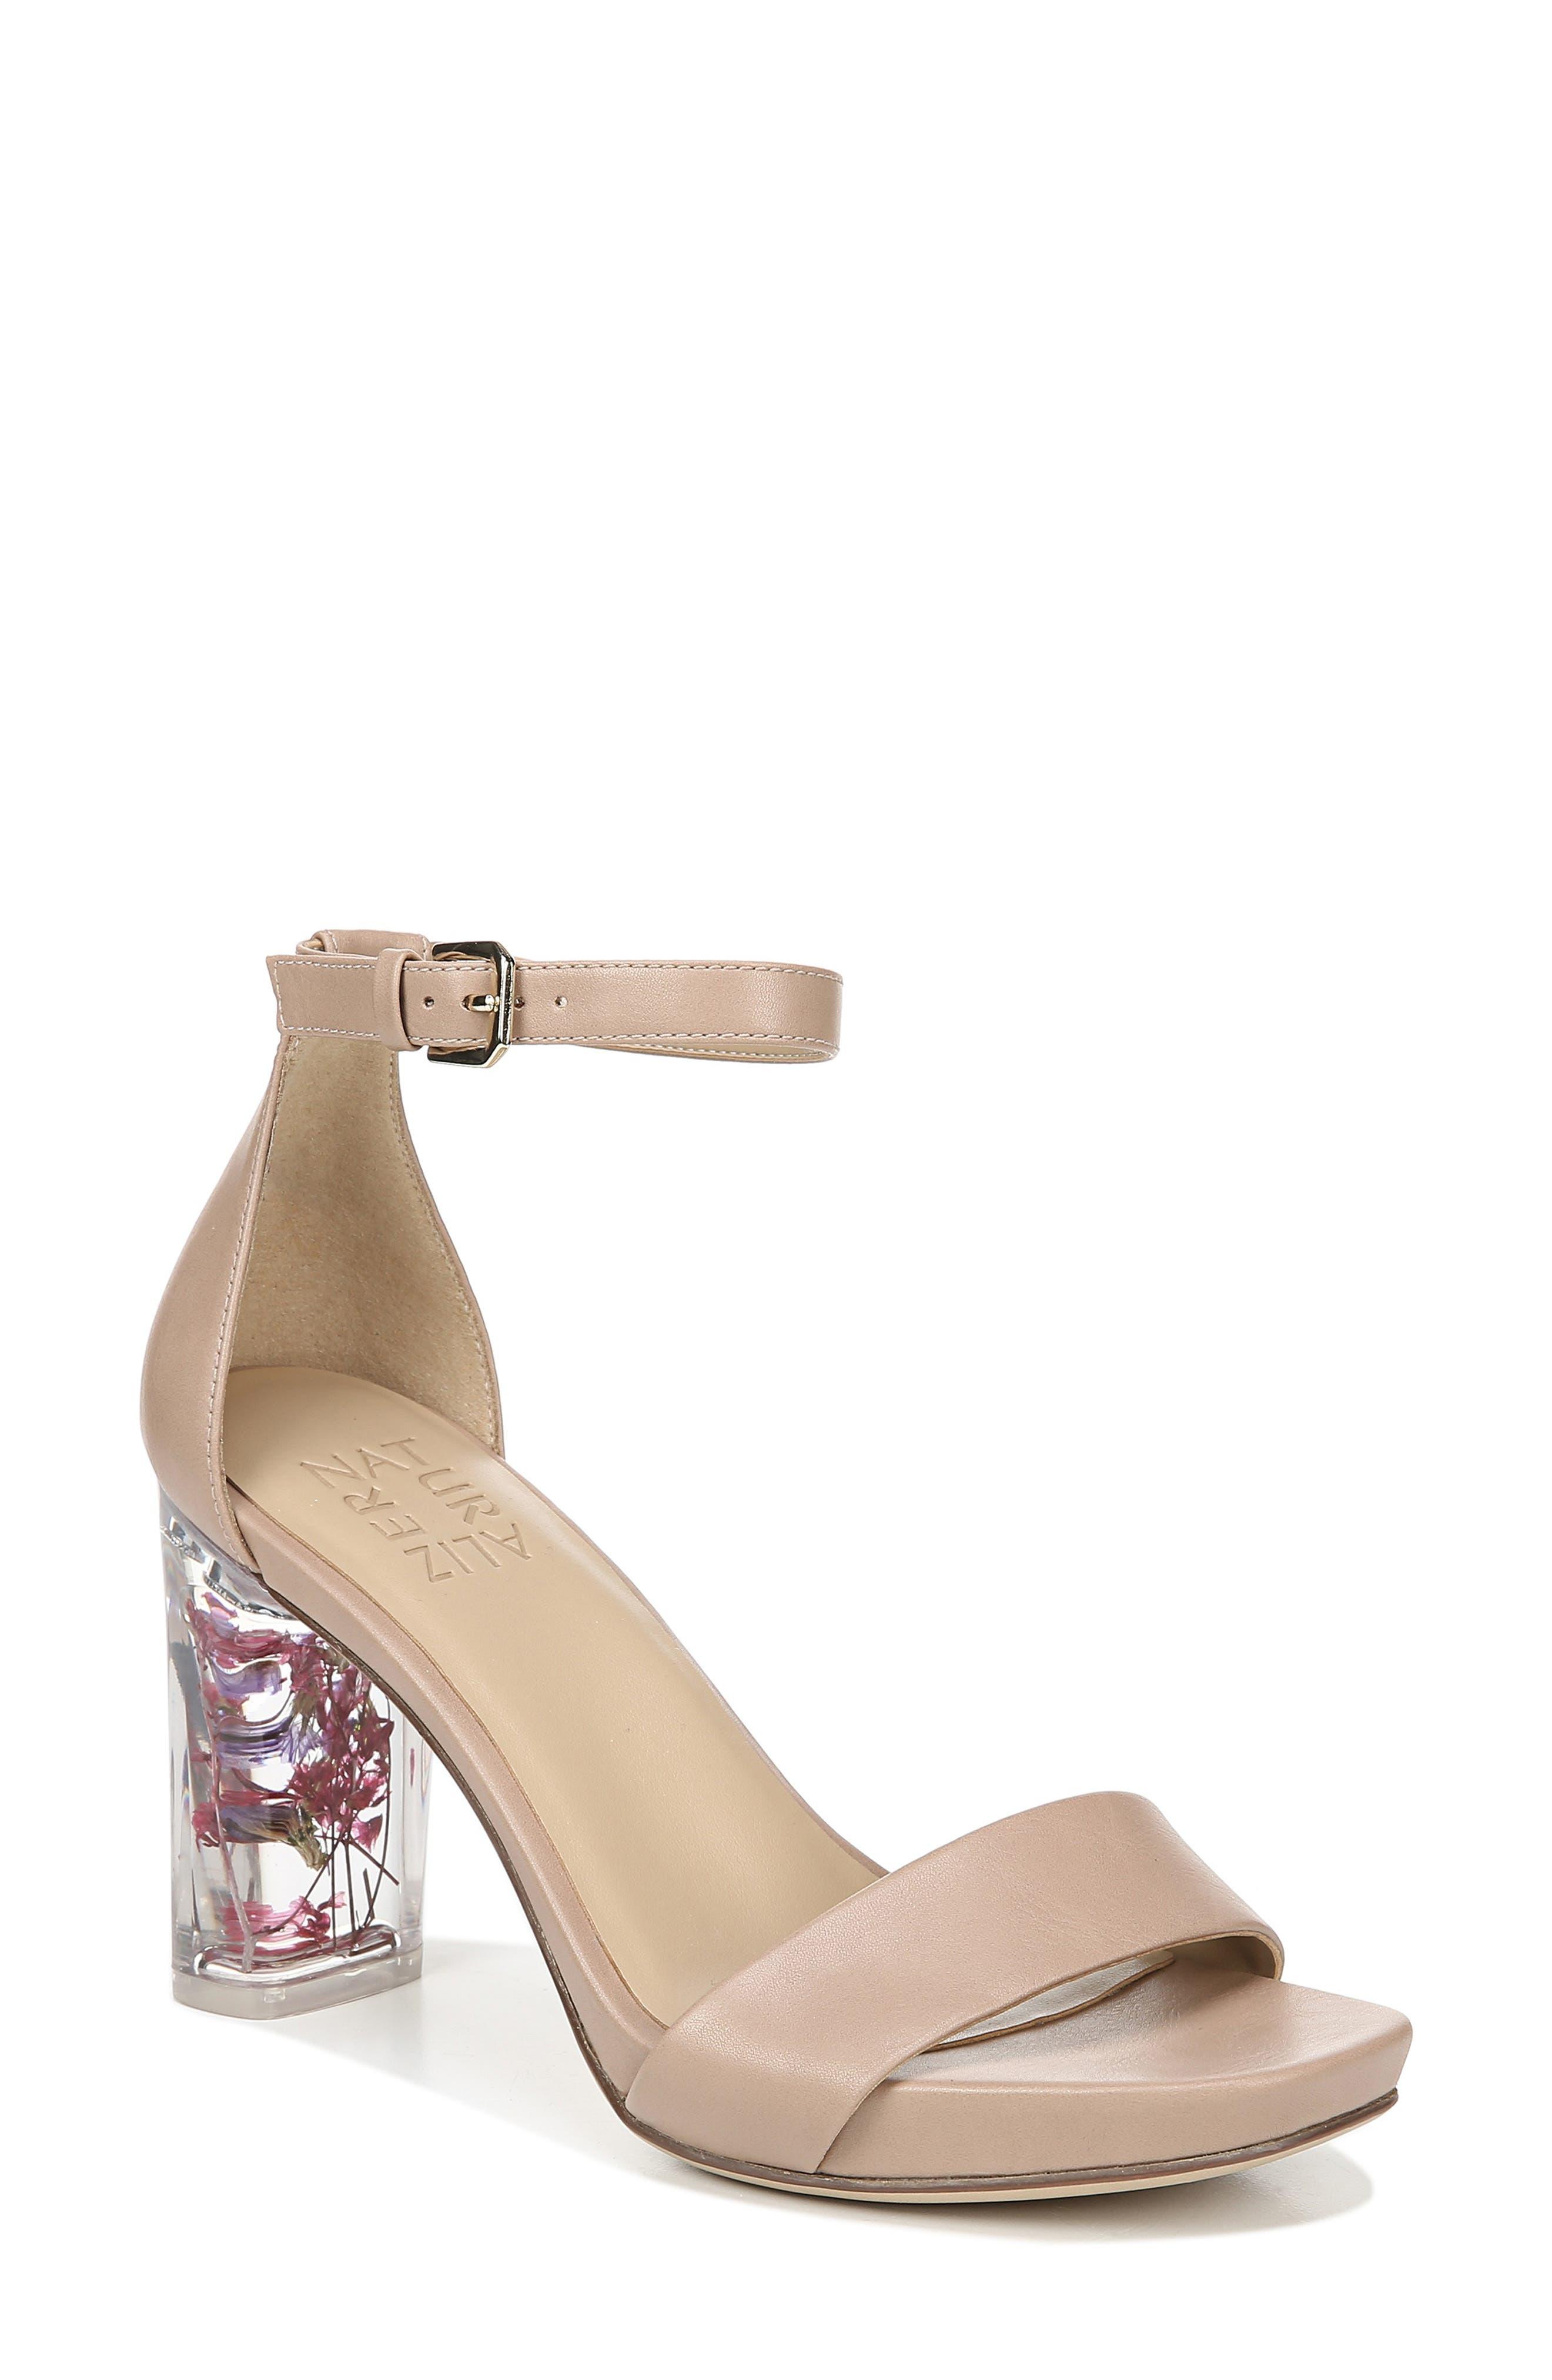 Joy Block Heel Sandal, Main, color, GINGERSNAP SMOOTH LEATHER